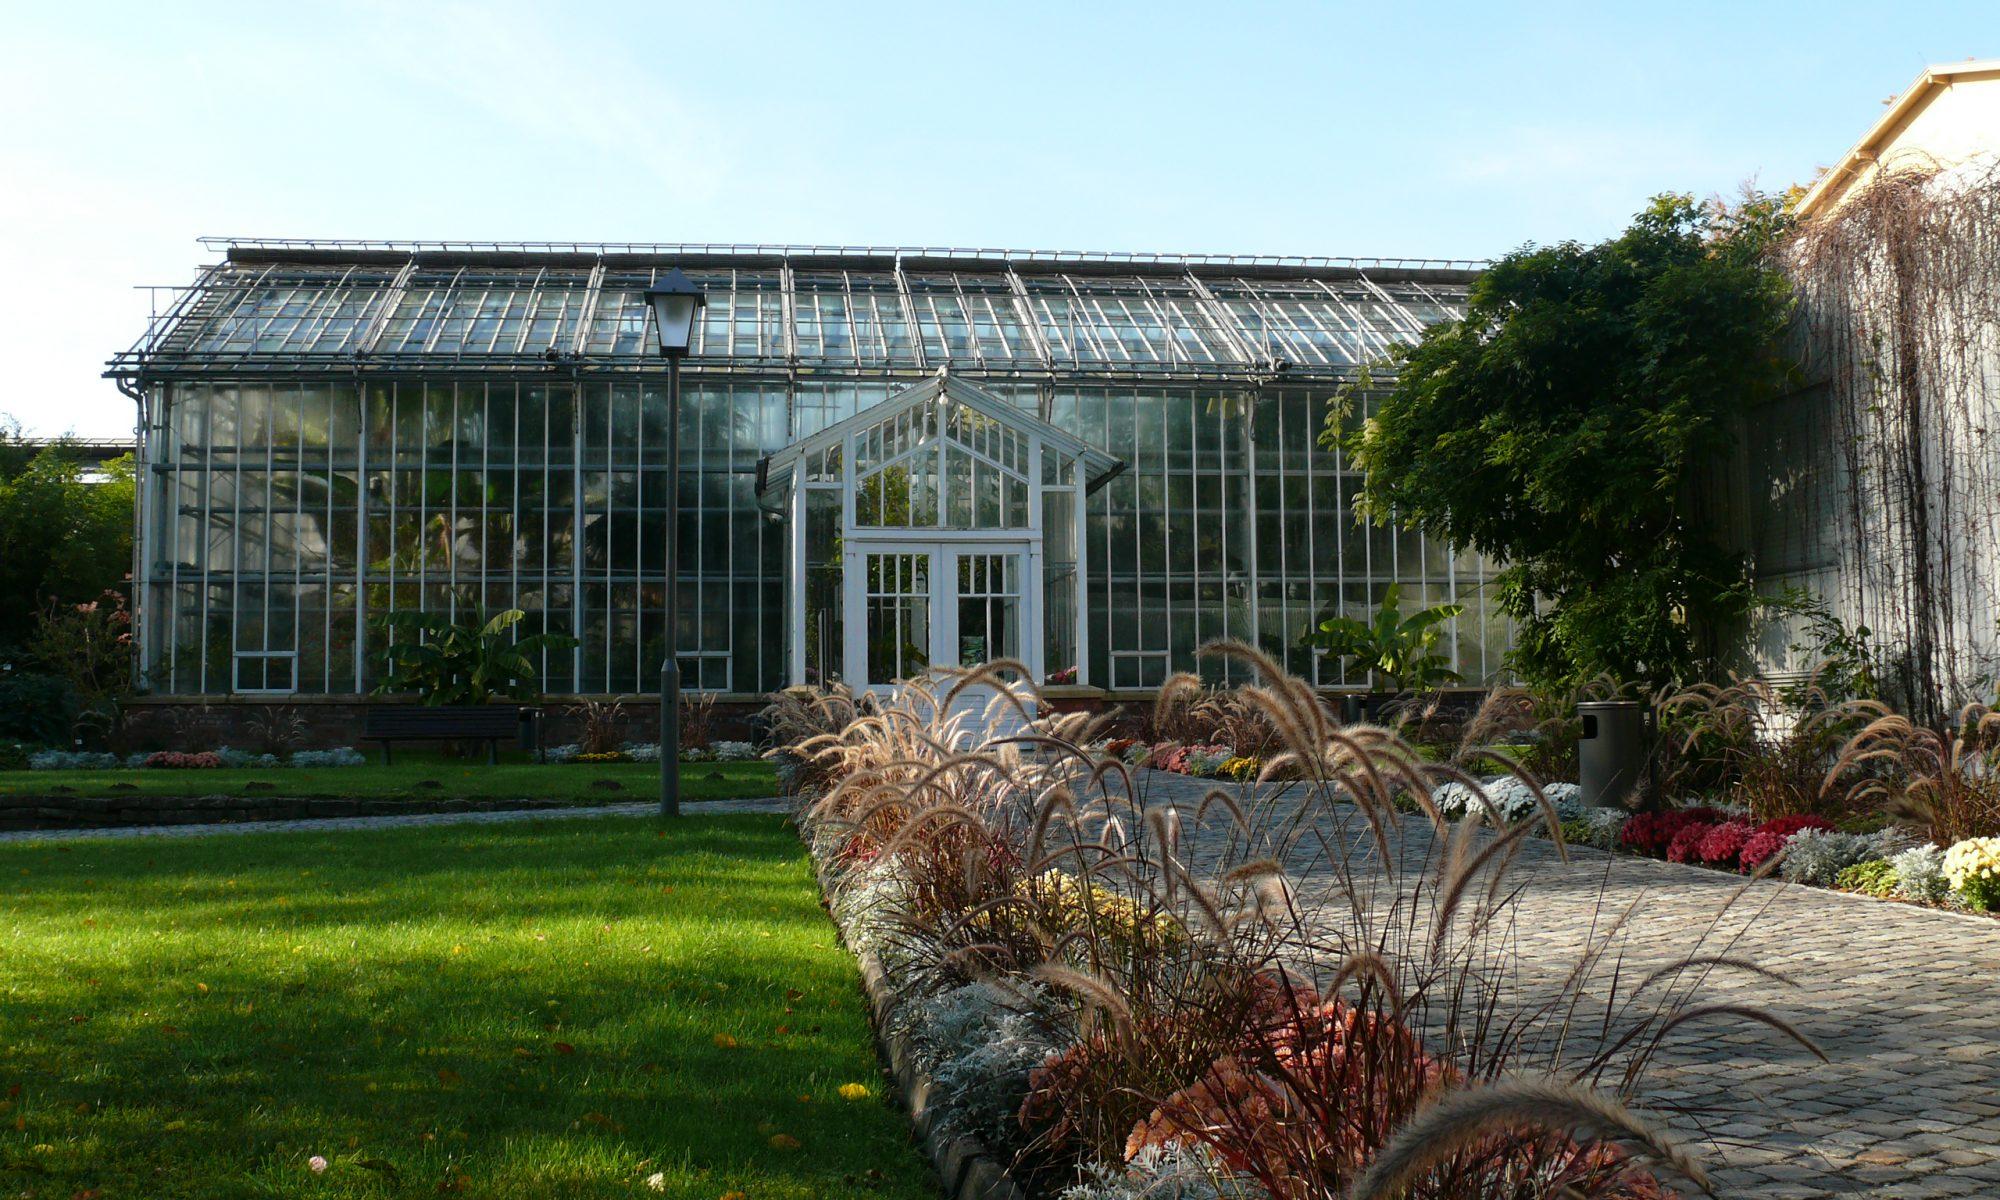 Freundeskreis des Botanischen Gartens der Universität Potsdam e.V.